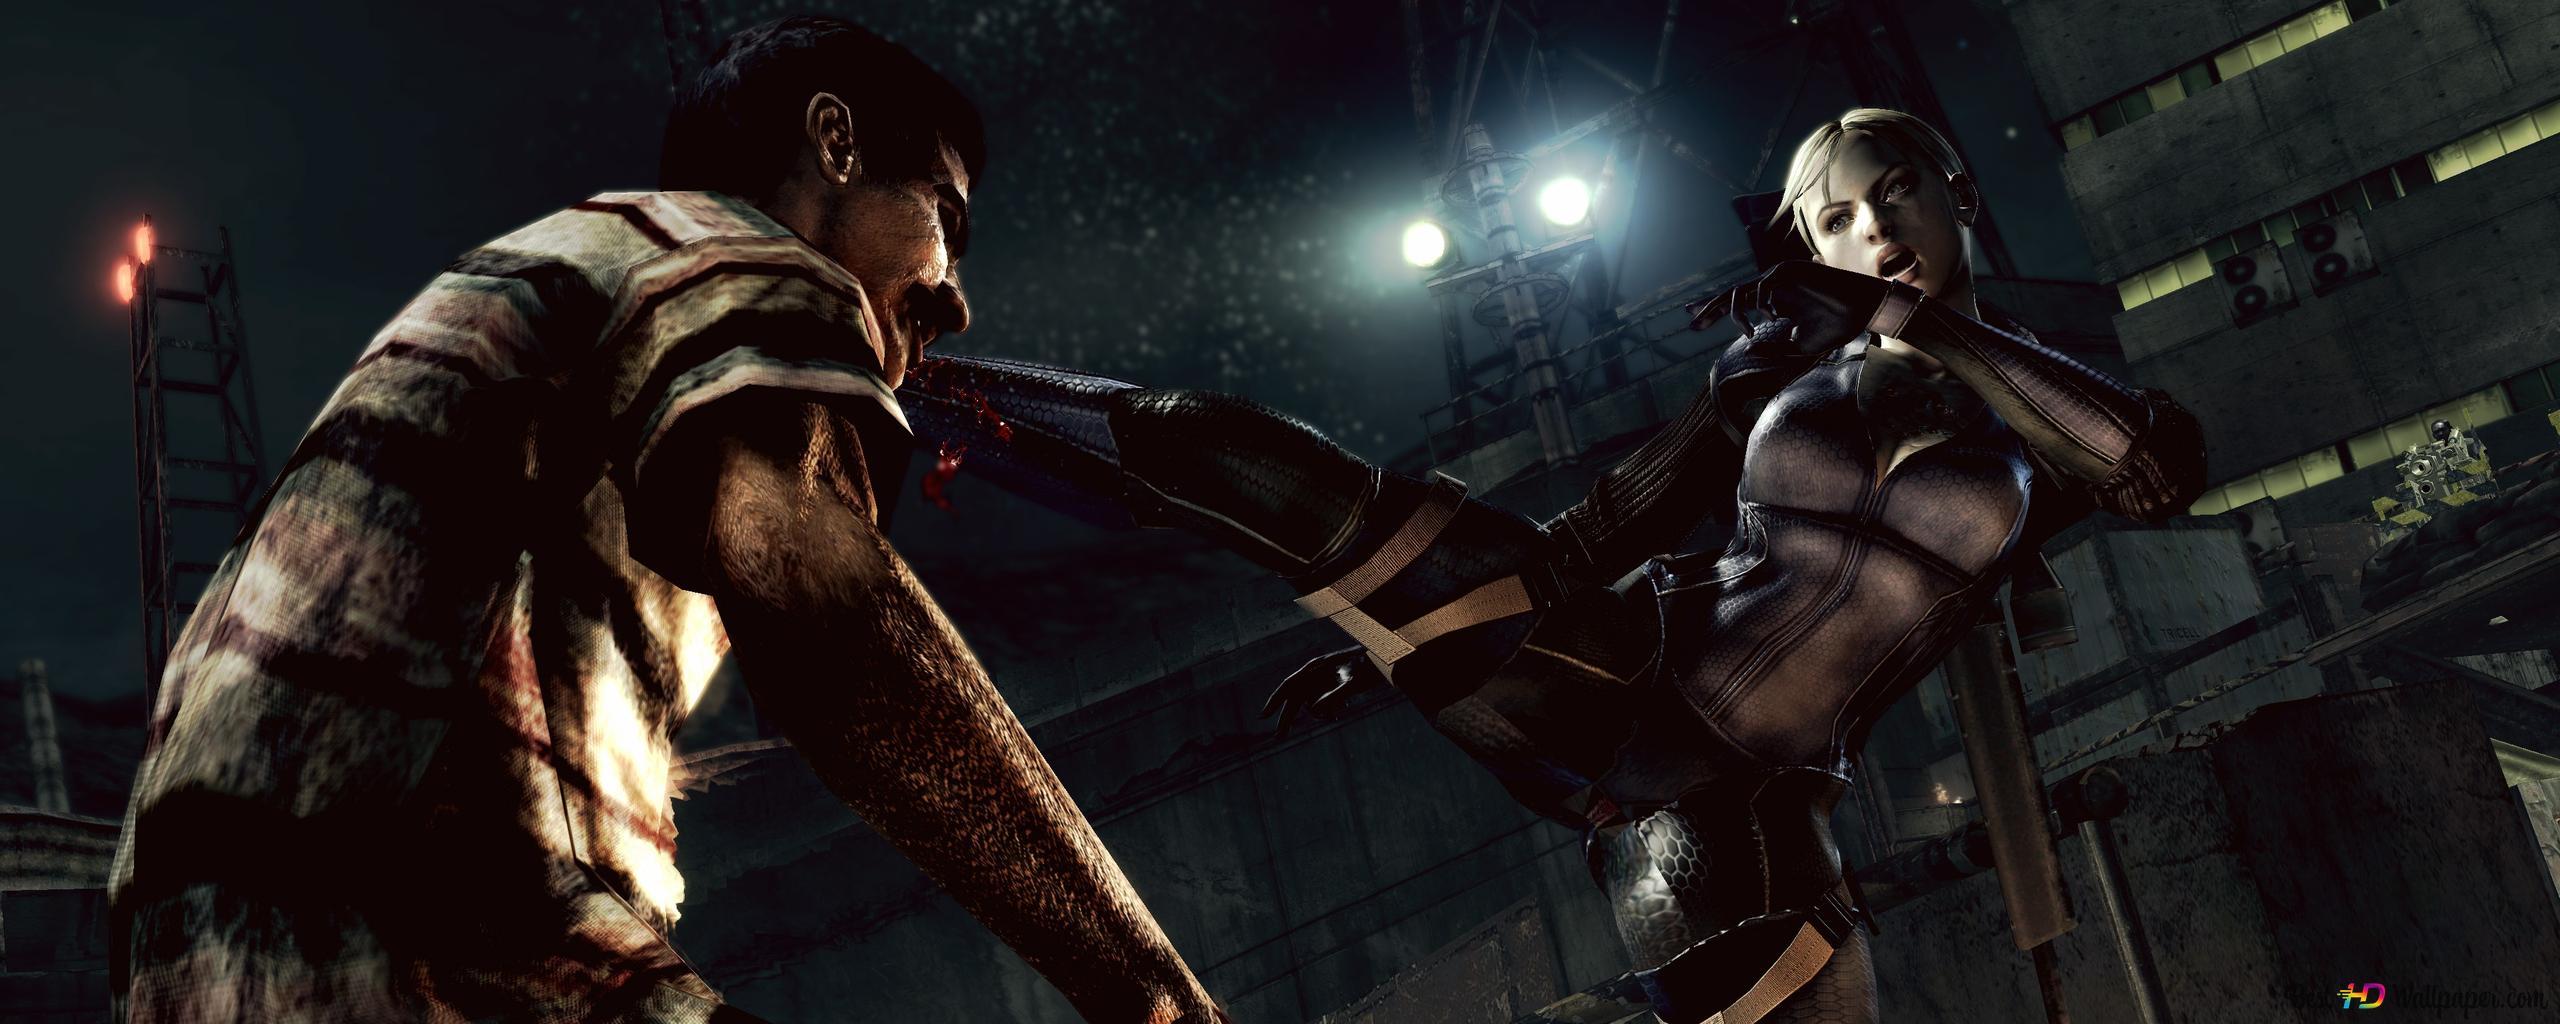 Resident Evil Sherry Hd Wallpaper Download